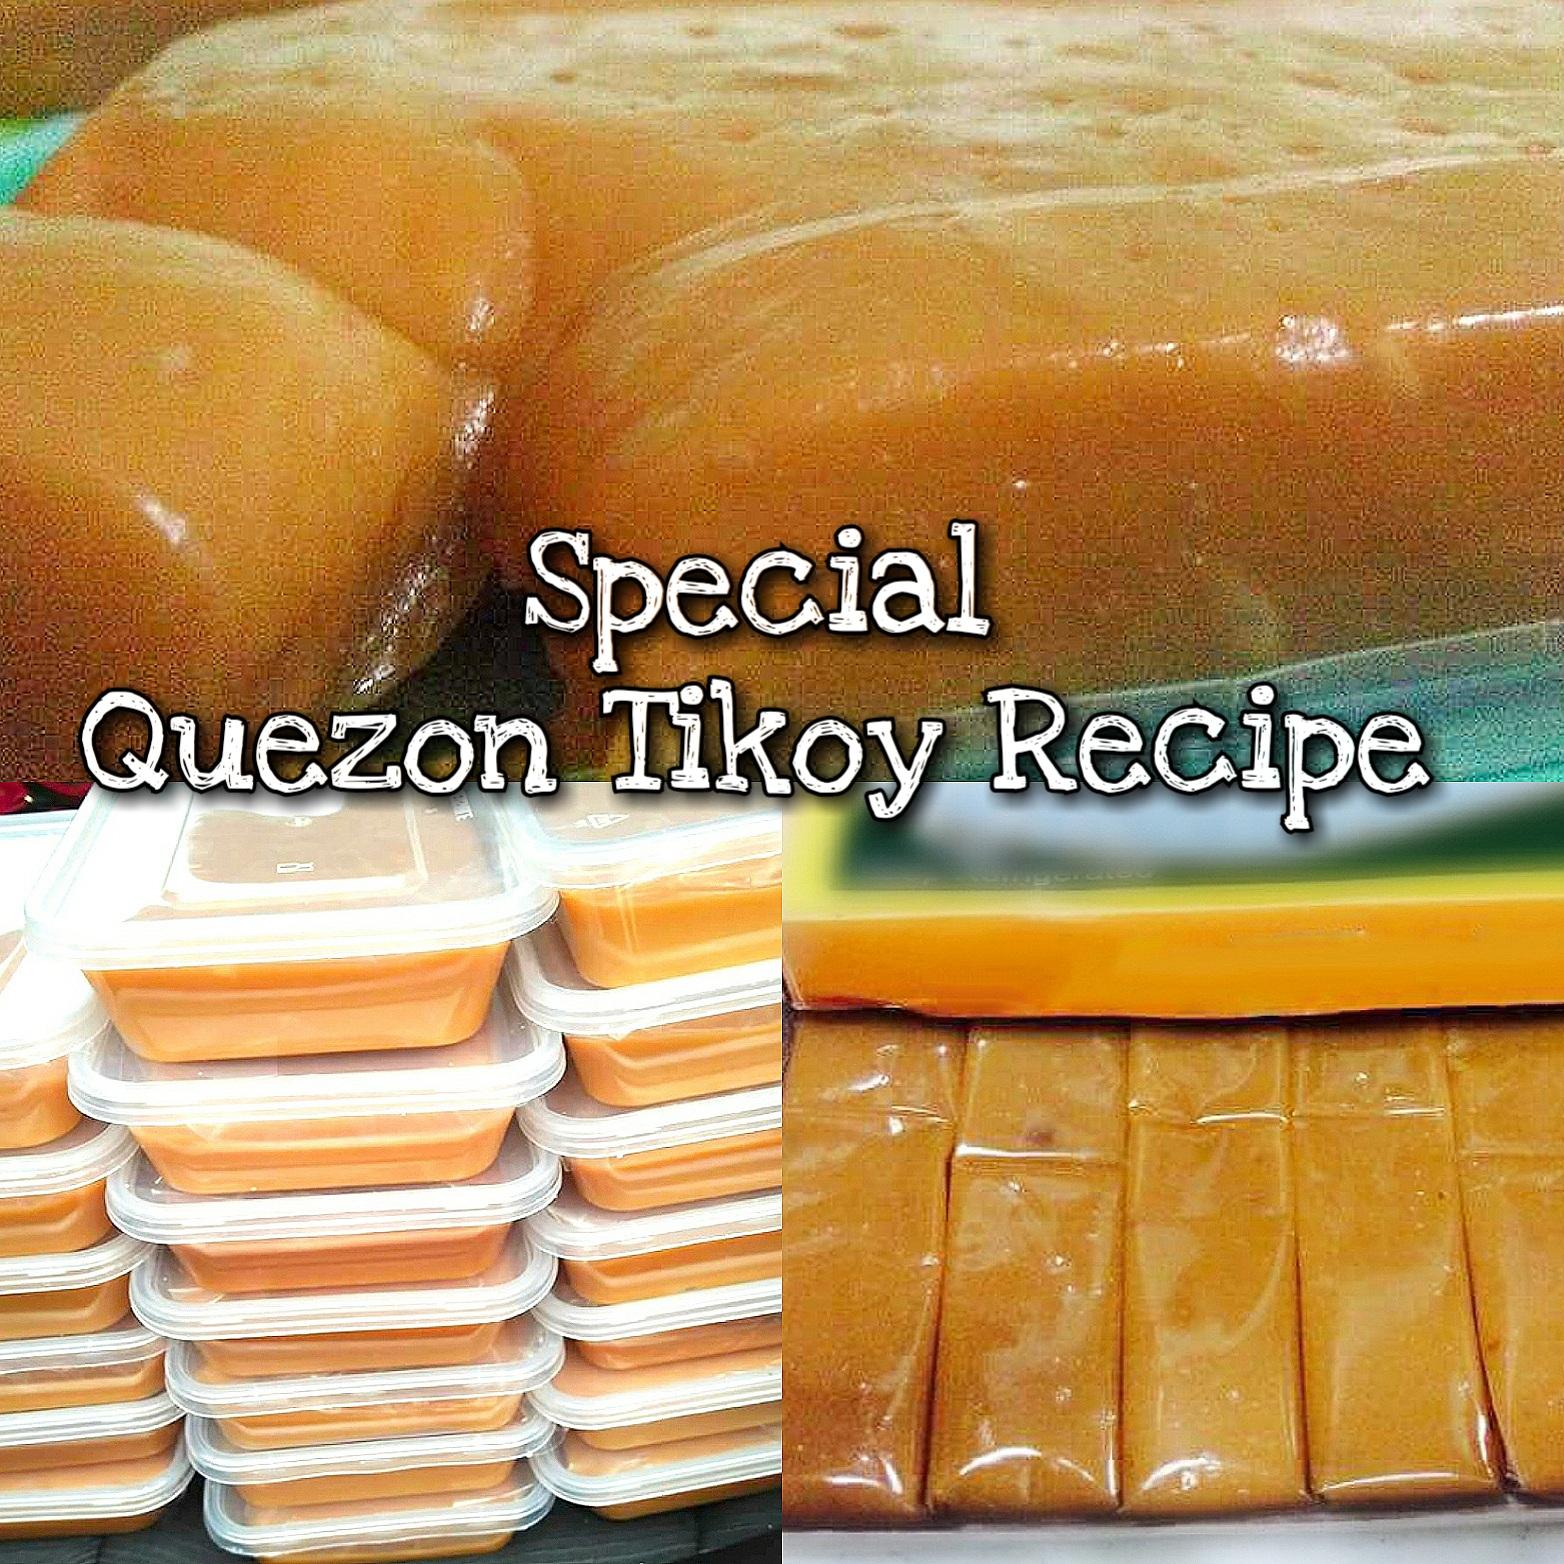 Special Quezon Tikoy Recipe